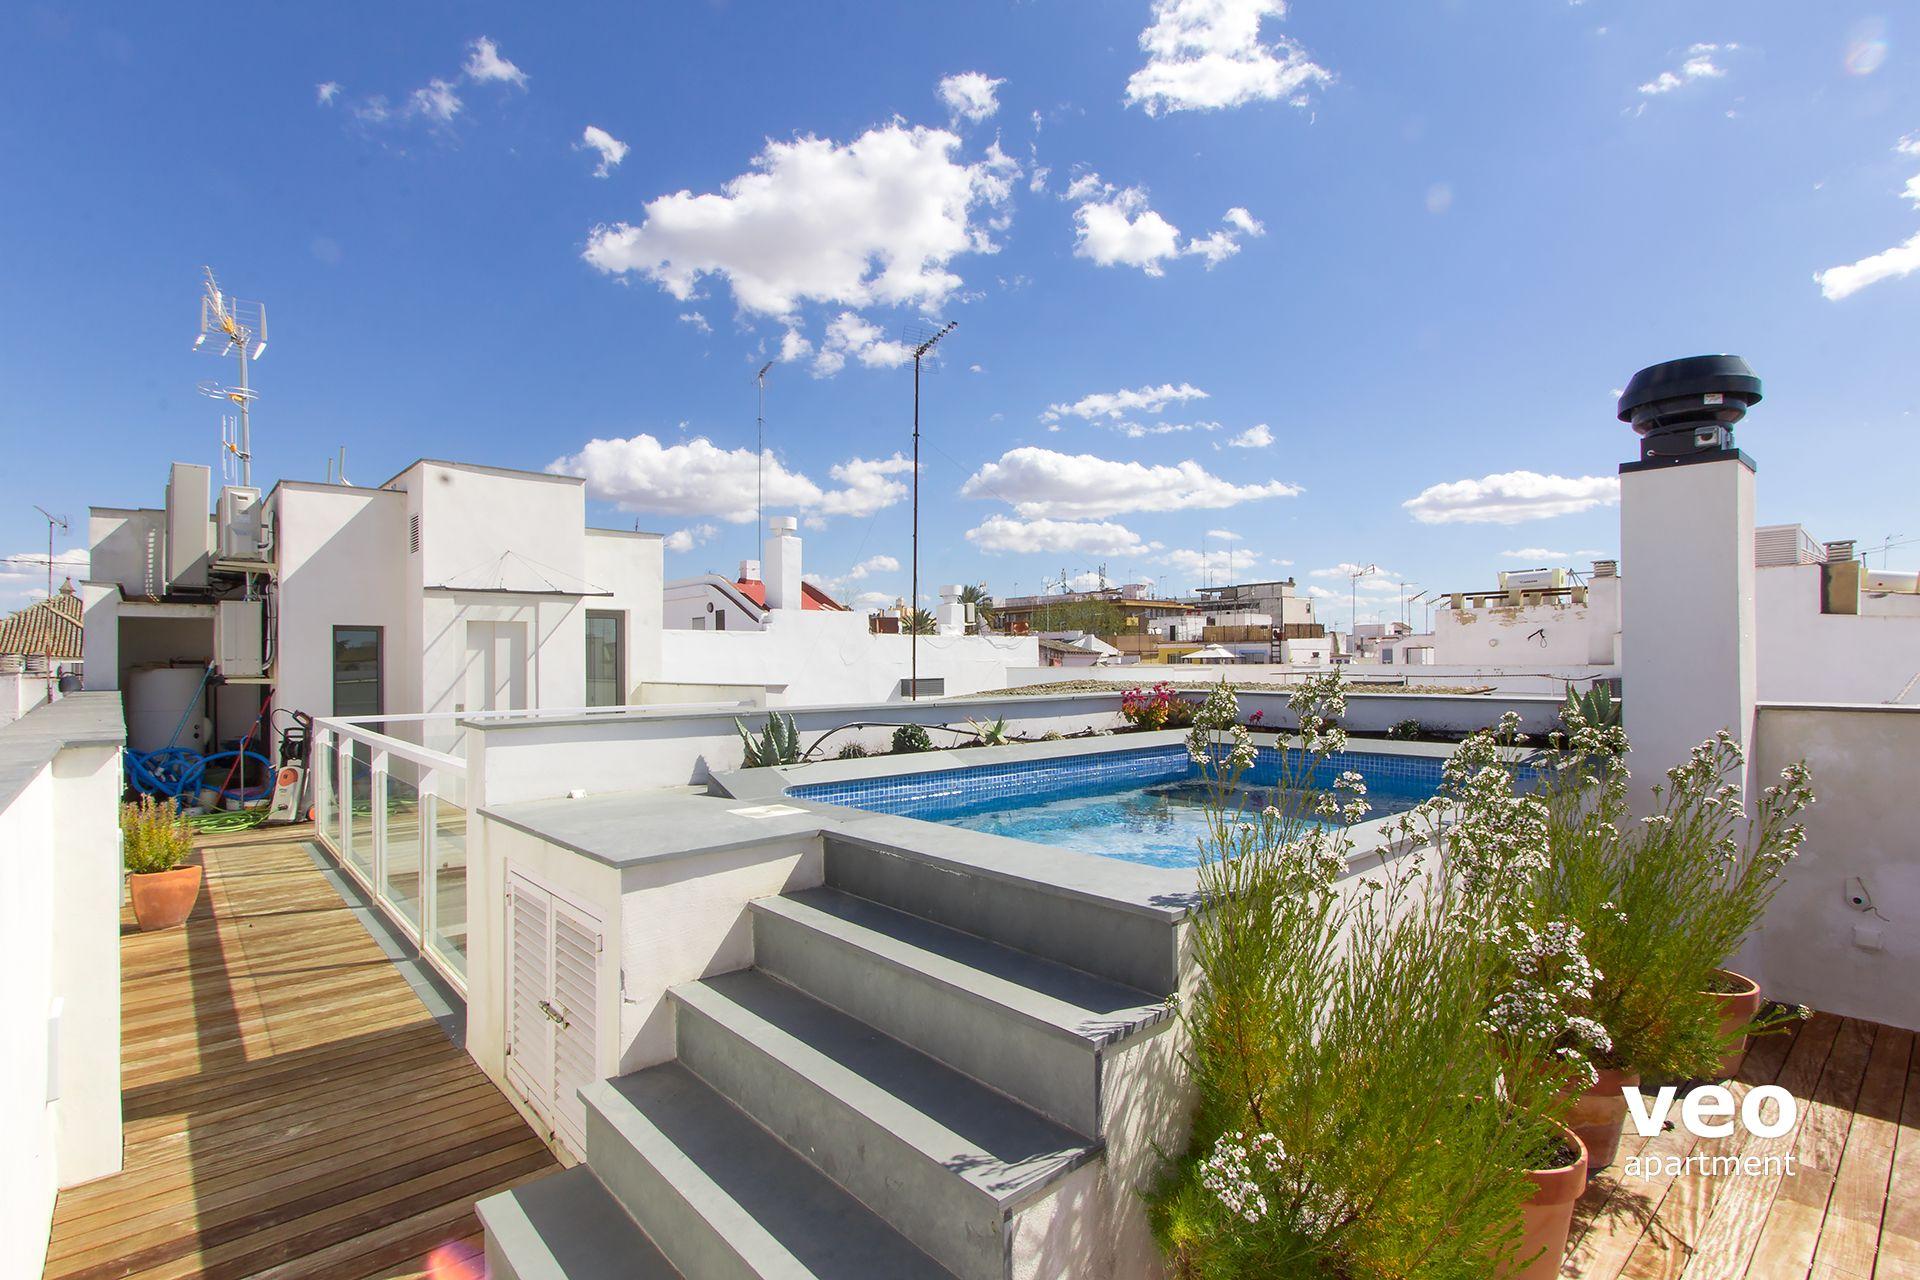 Appartement rue teodosio s ville espagne teodosio for Location appartement avec terrasse 92